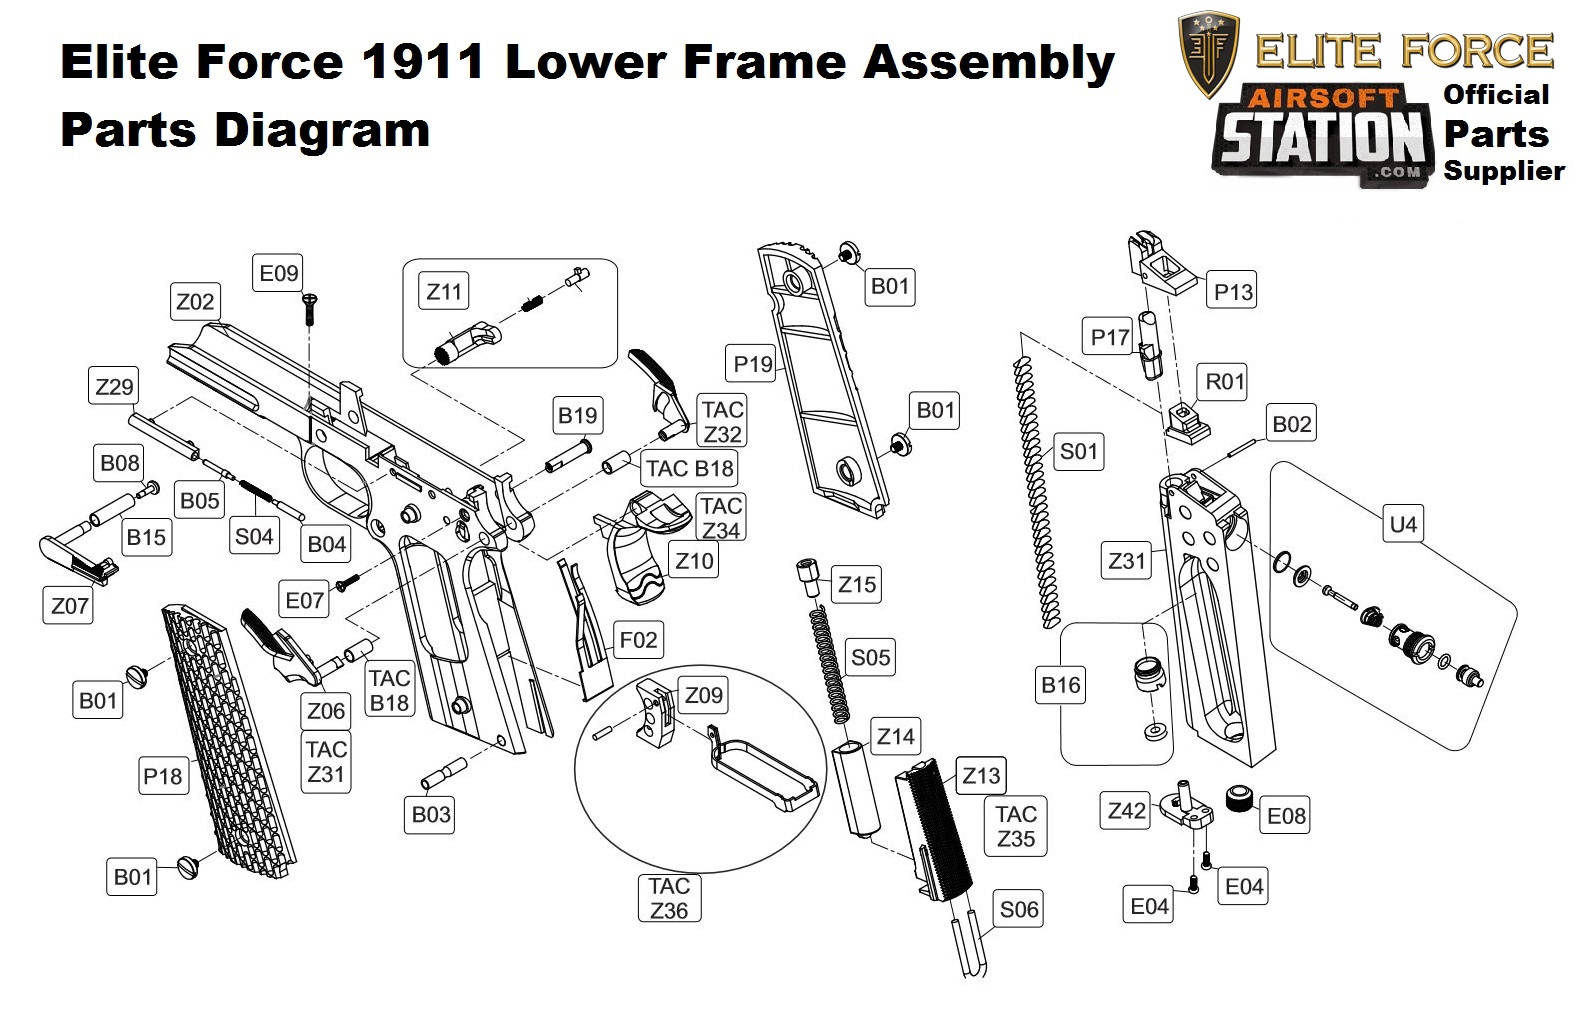 opus metal frame assembly pdf